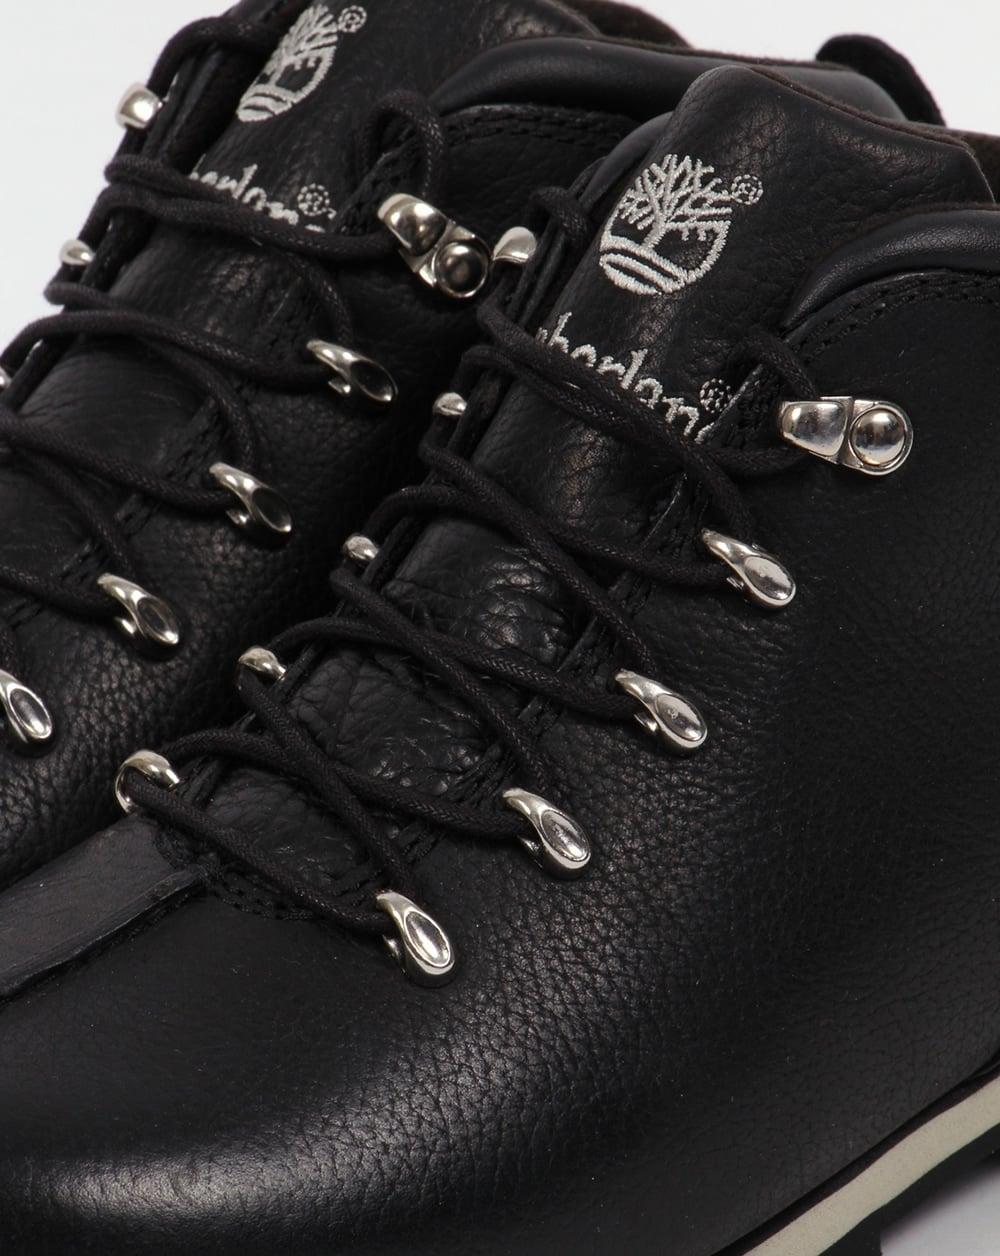 97ccfdcc224 Timberland Splitrock Hiker Boots Black